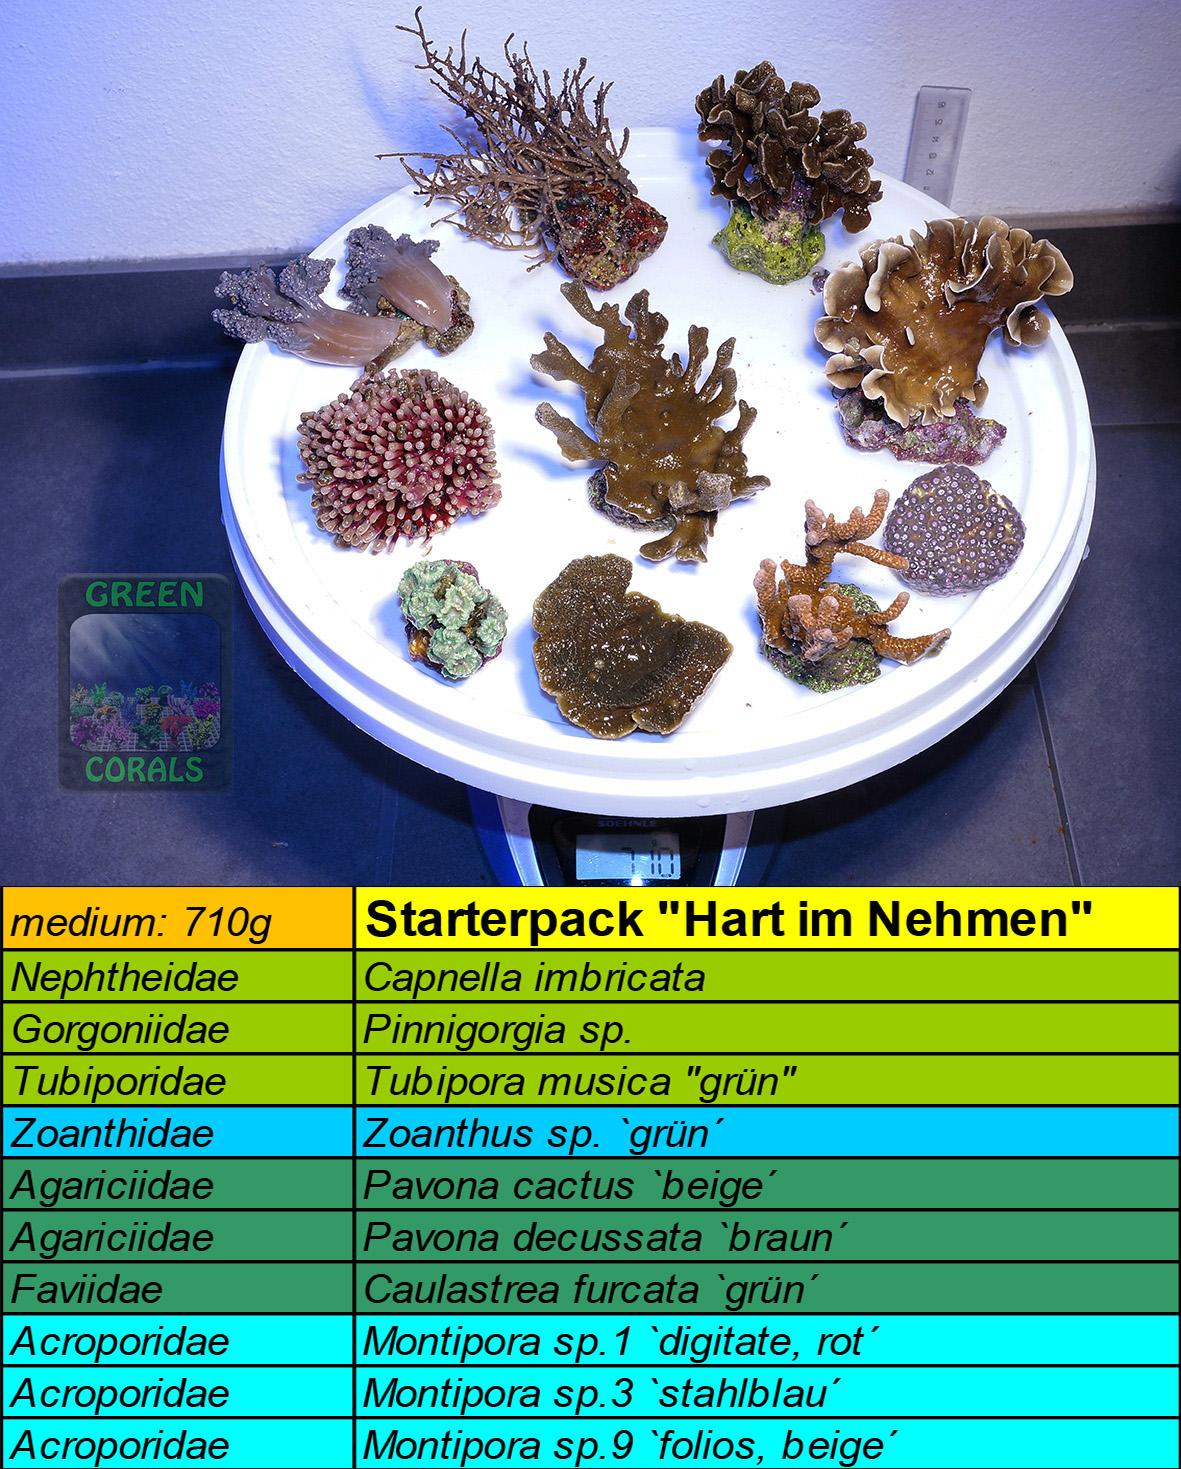 1-starterpack-hart-im-nehmen-710g